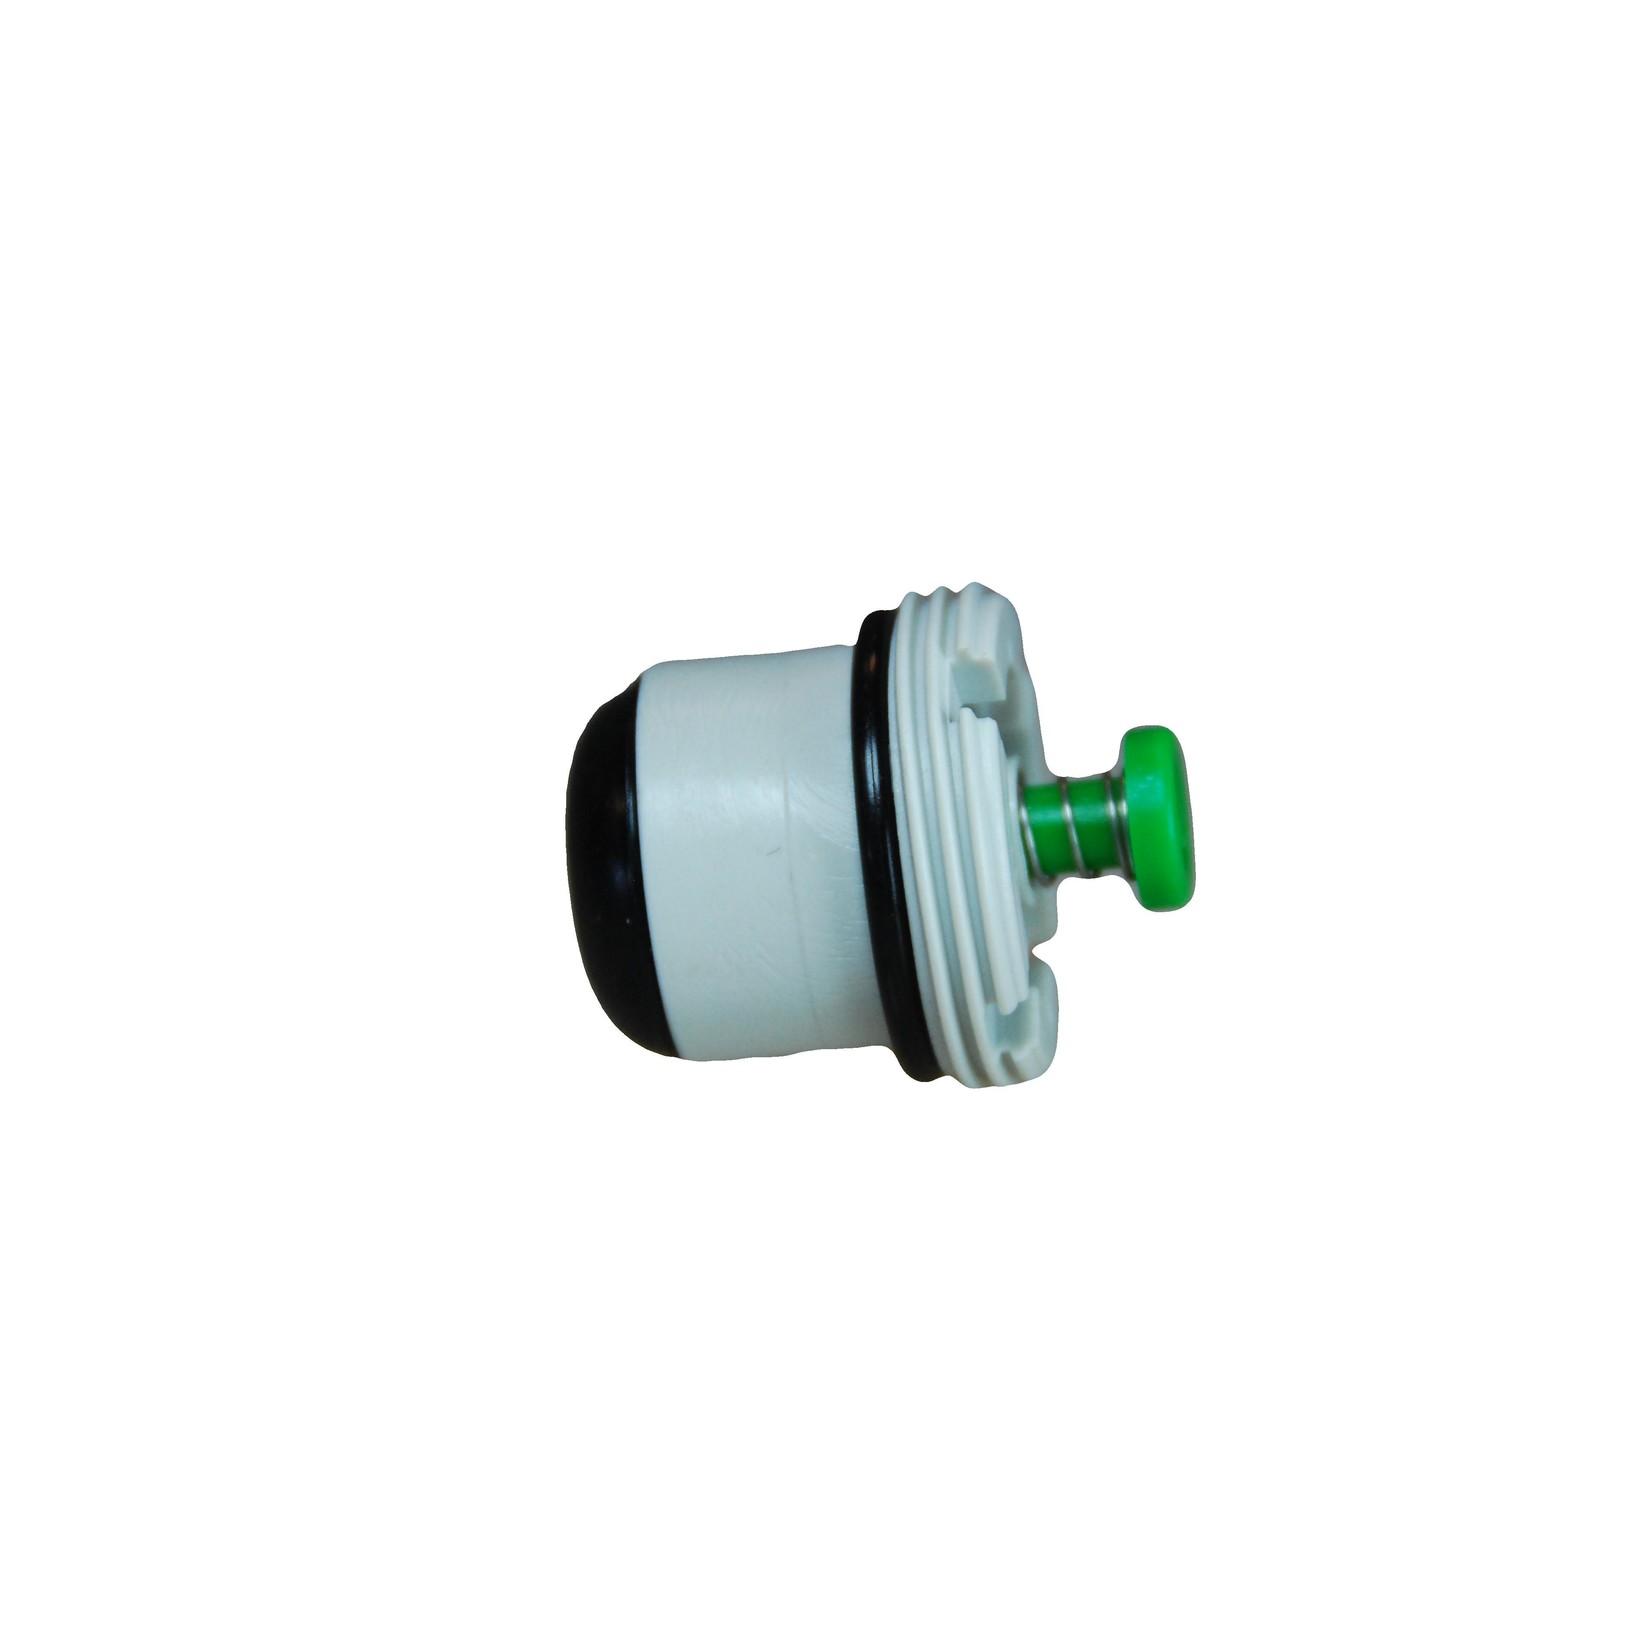 Zodiac Ventielinzet Z67080 - nieuw type ventiel